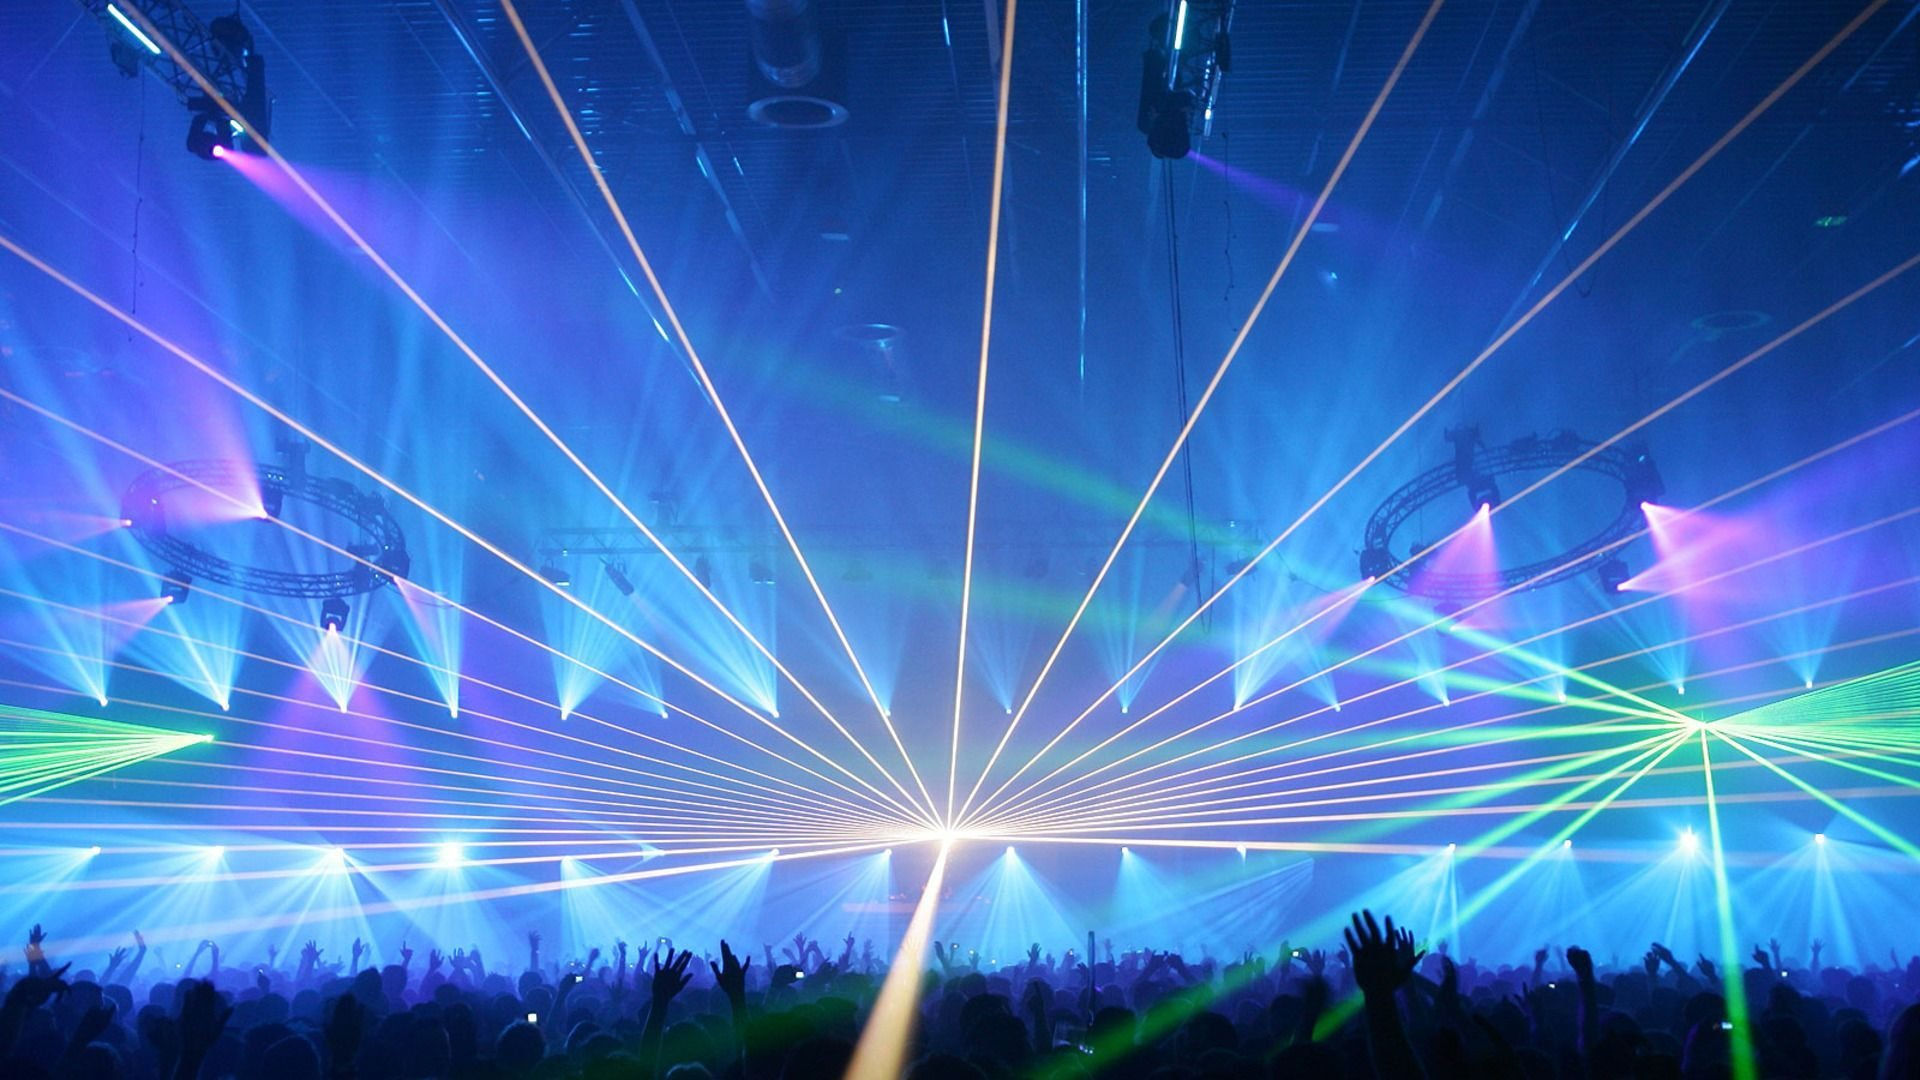 wallpaper muziek concert laser - photo #8